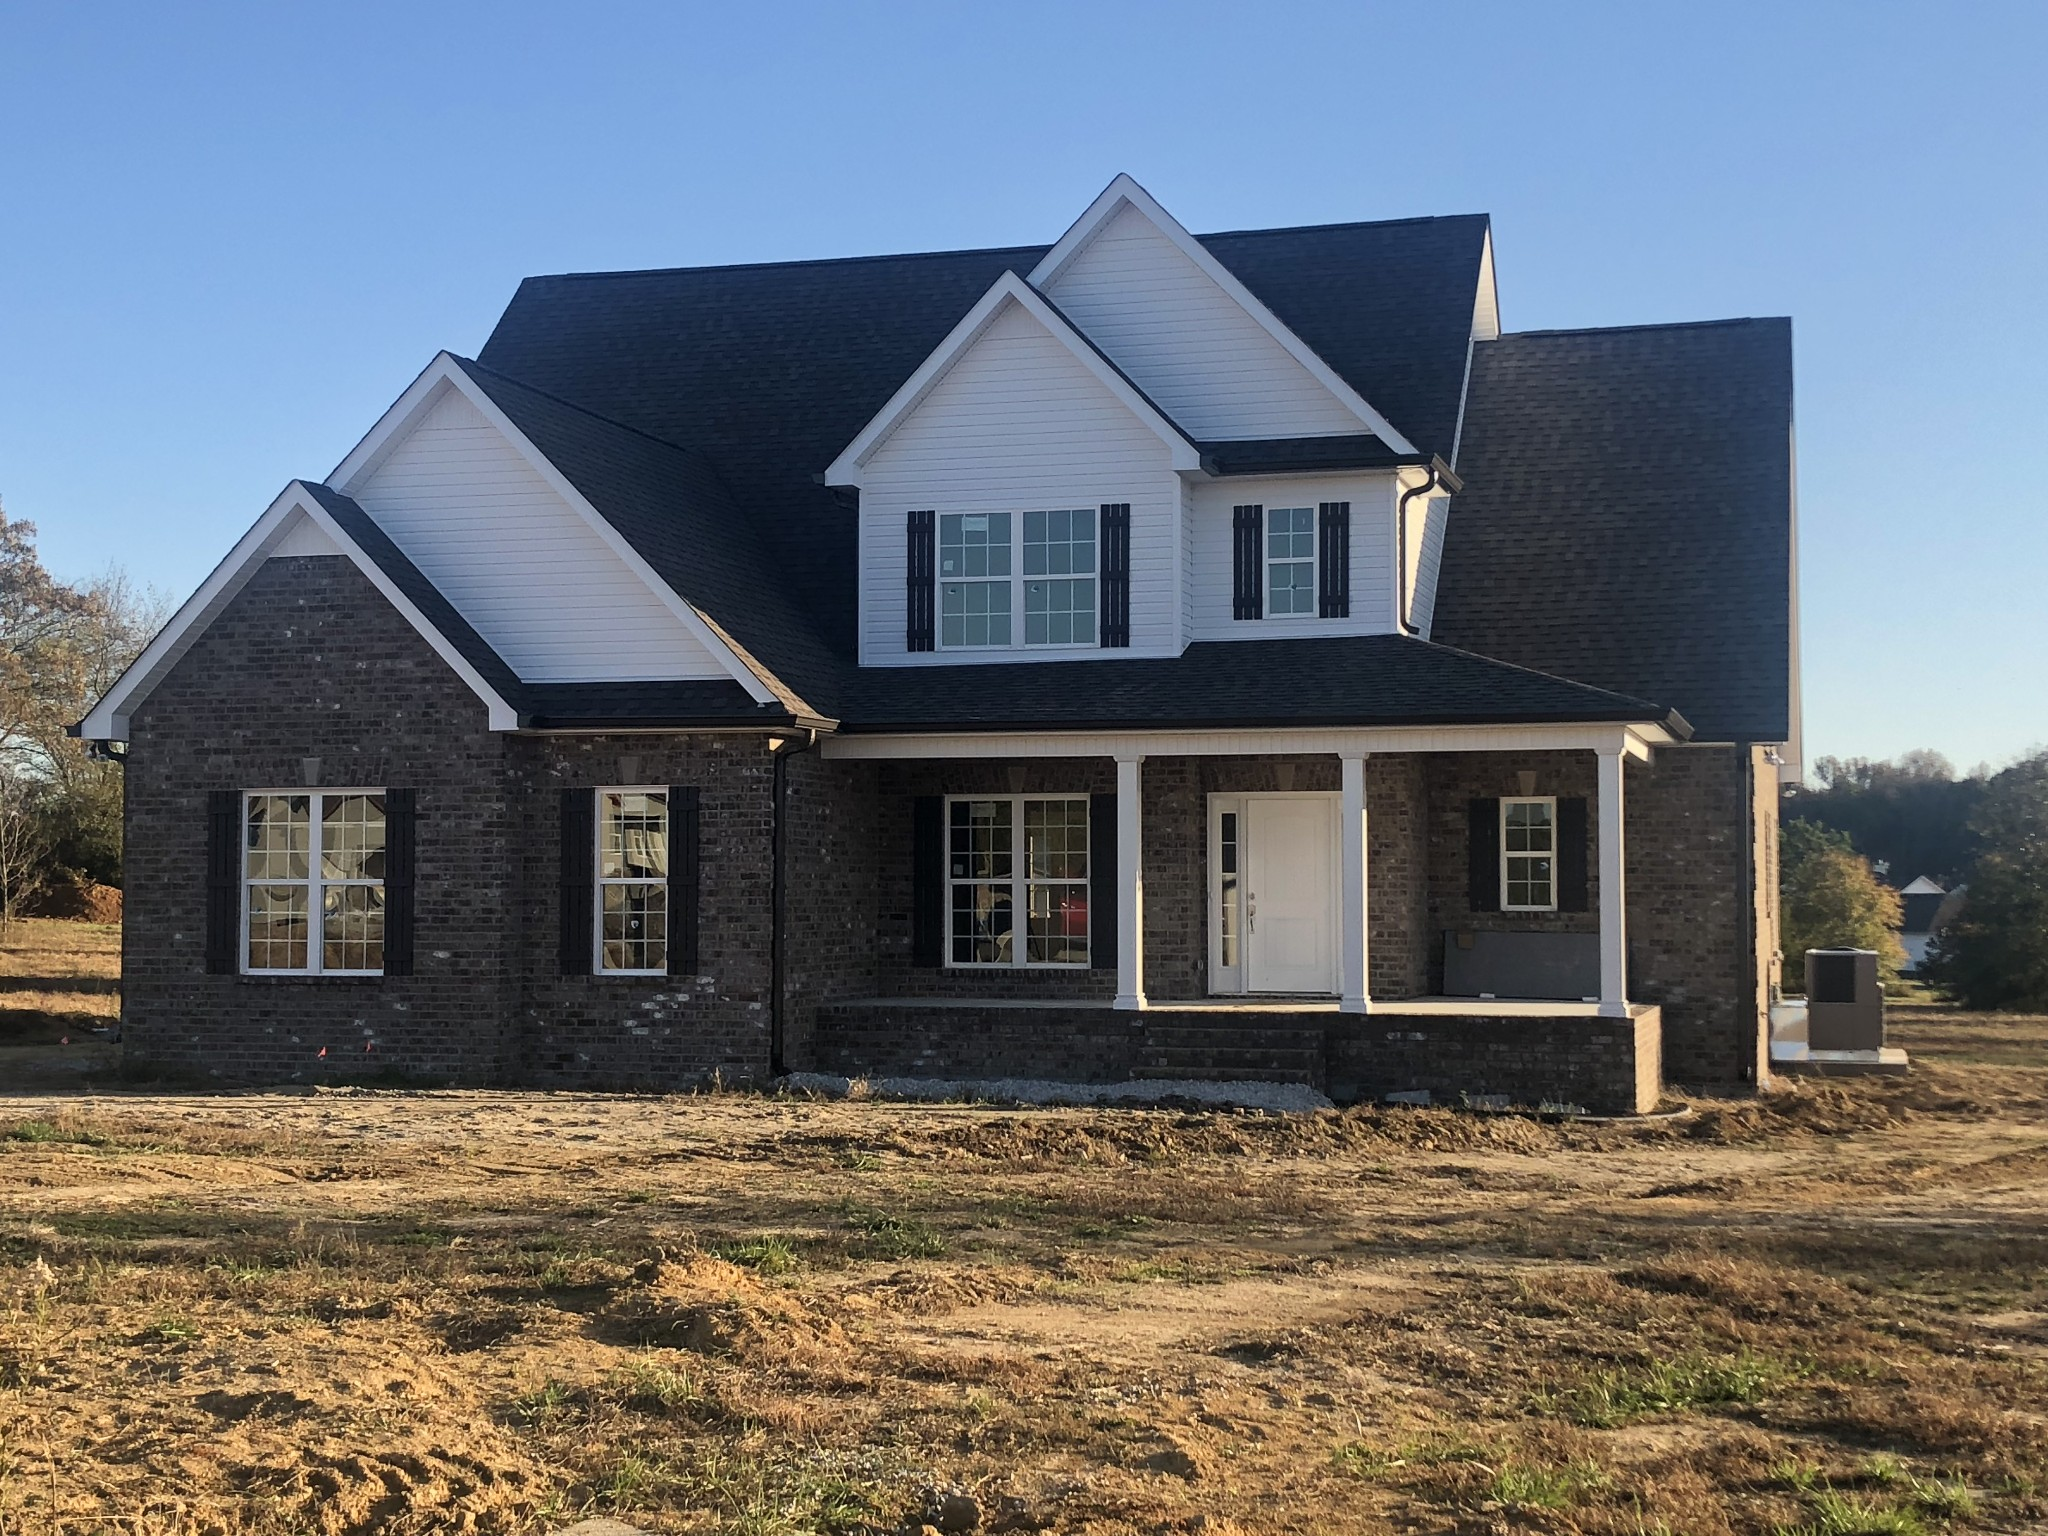 254 Aberdeen Ave, Hillsboro, TN 37342 - Hillsboro, TN real estate listing